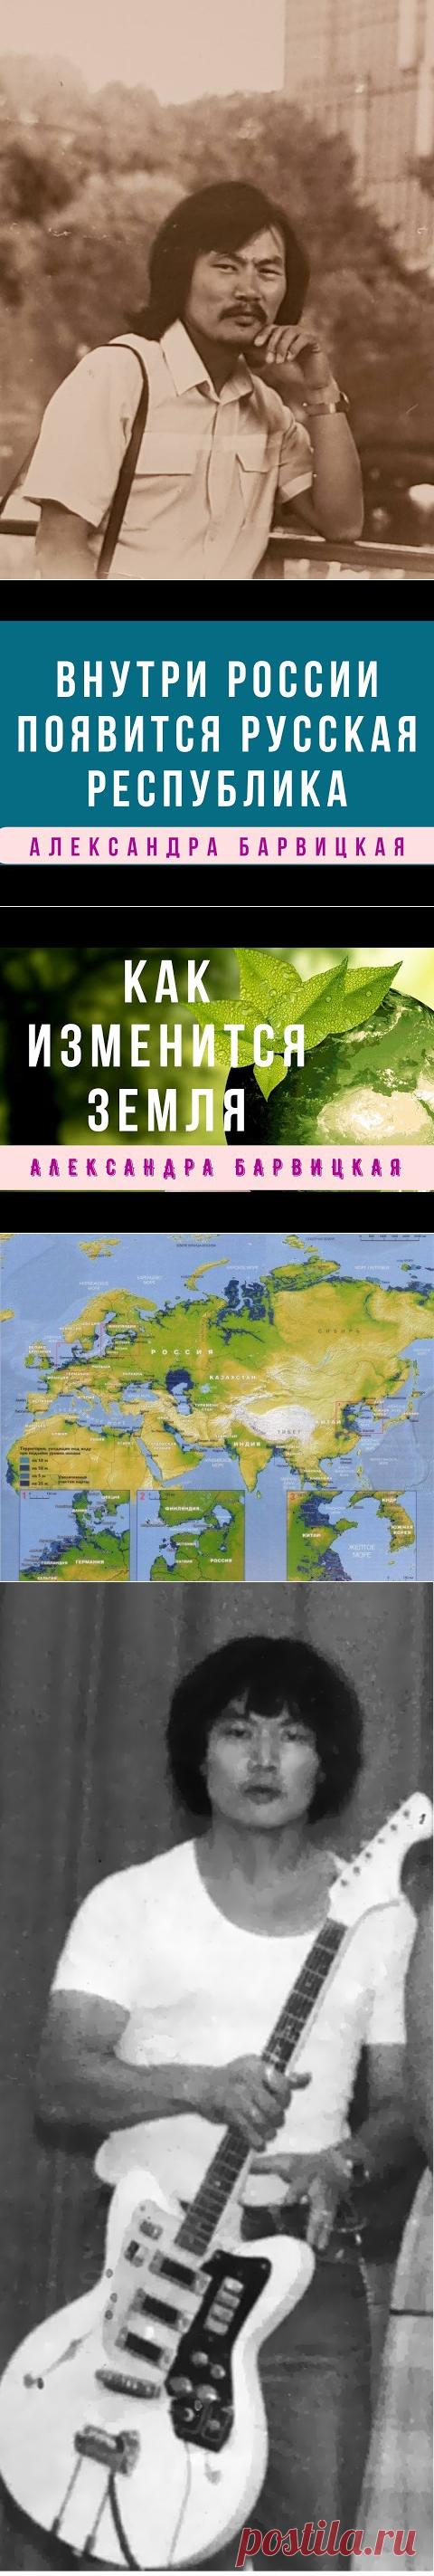 Хасыр Чогнунов на Postila